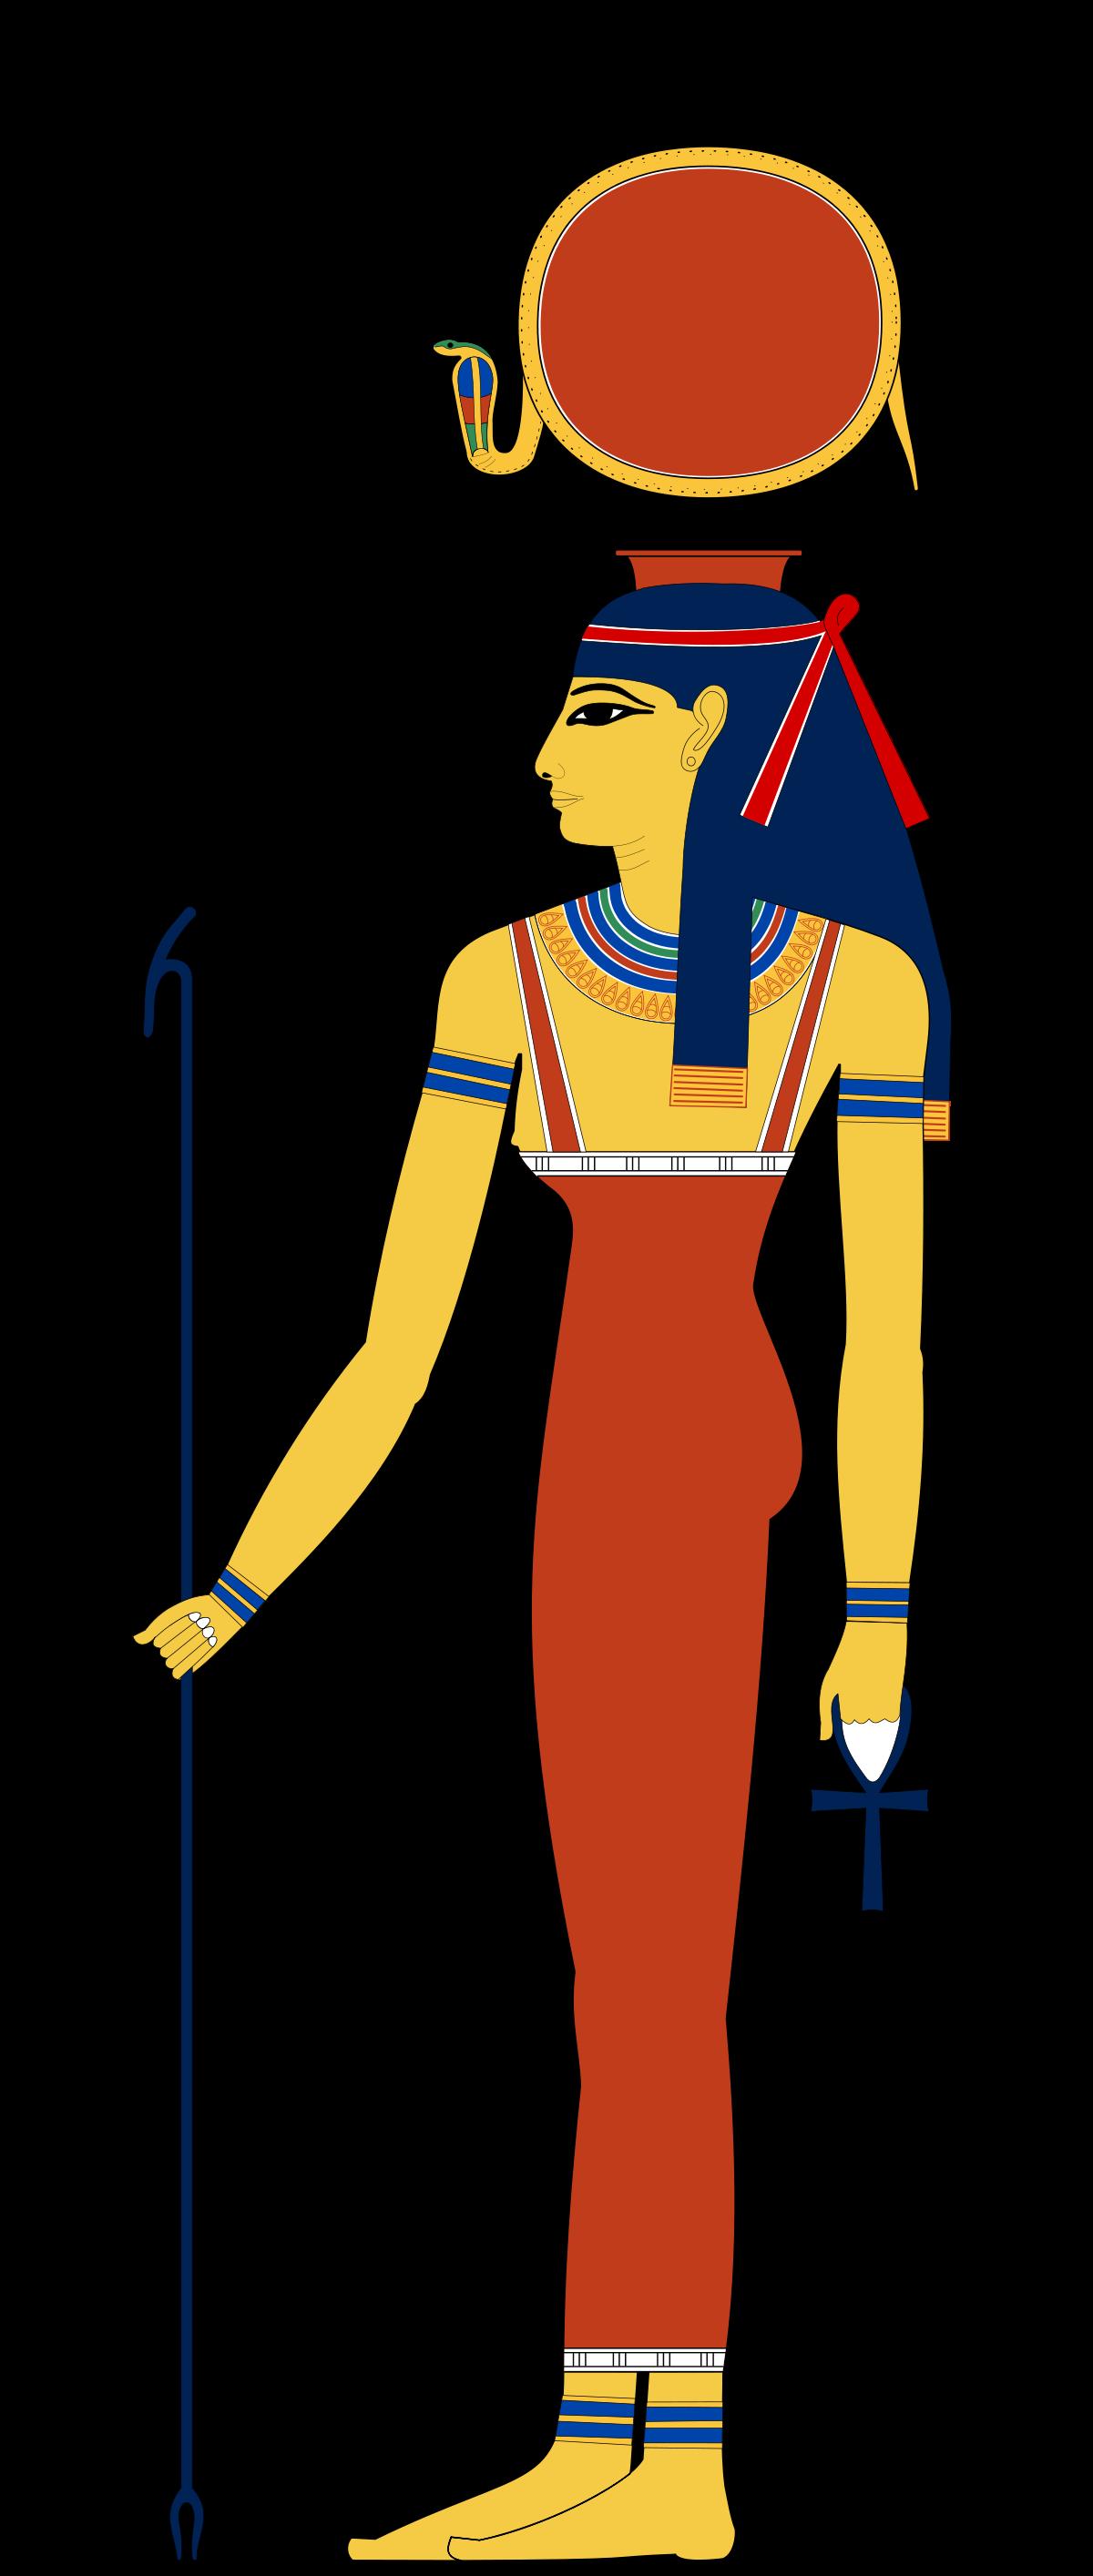 Hathor wikipedia . Horn clipart devel